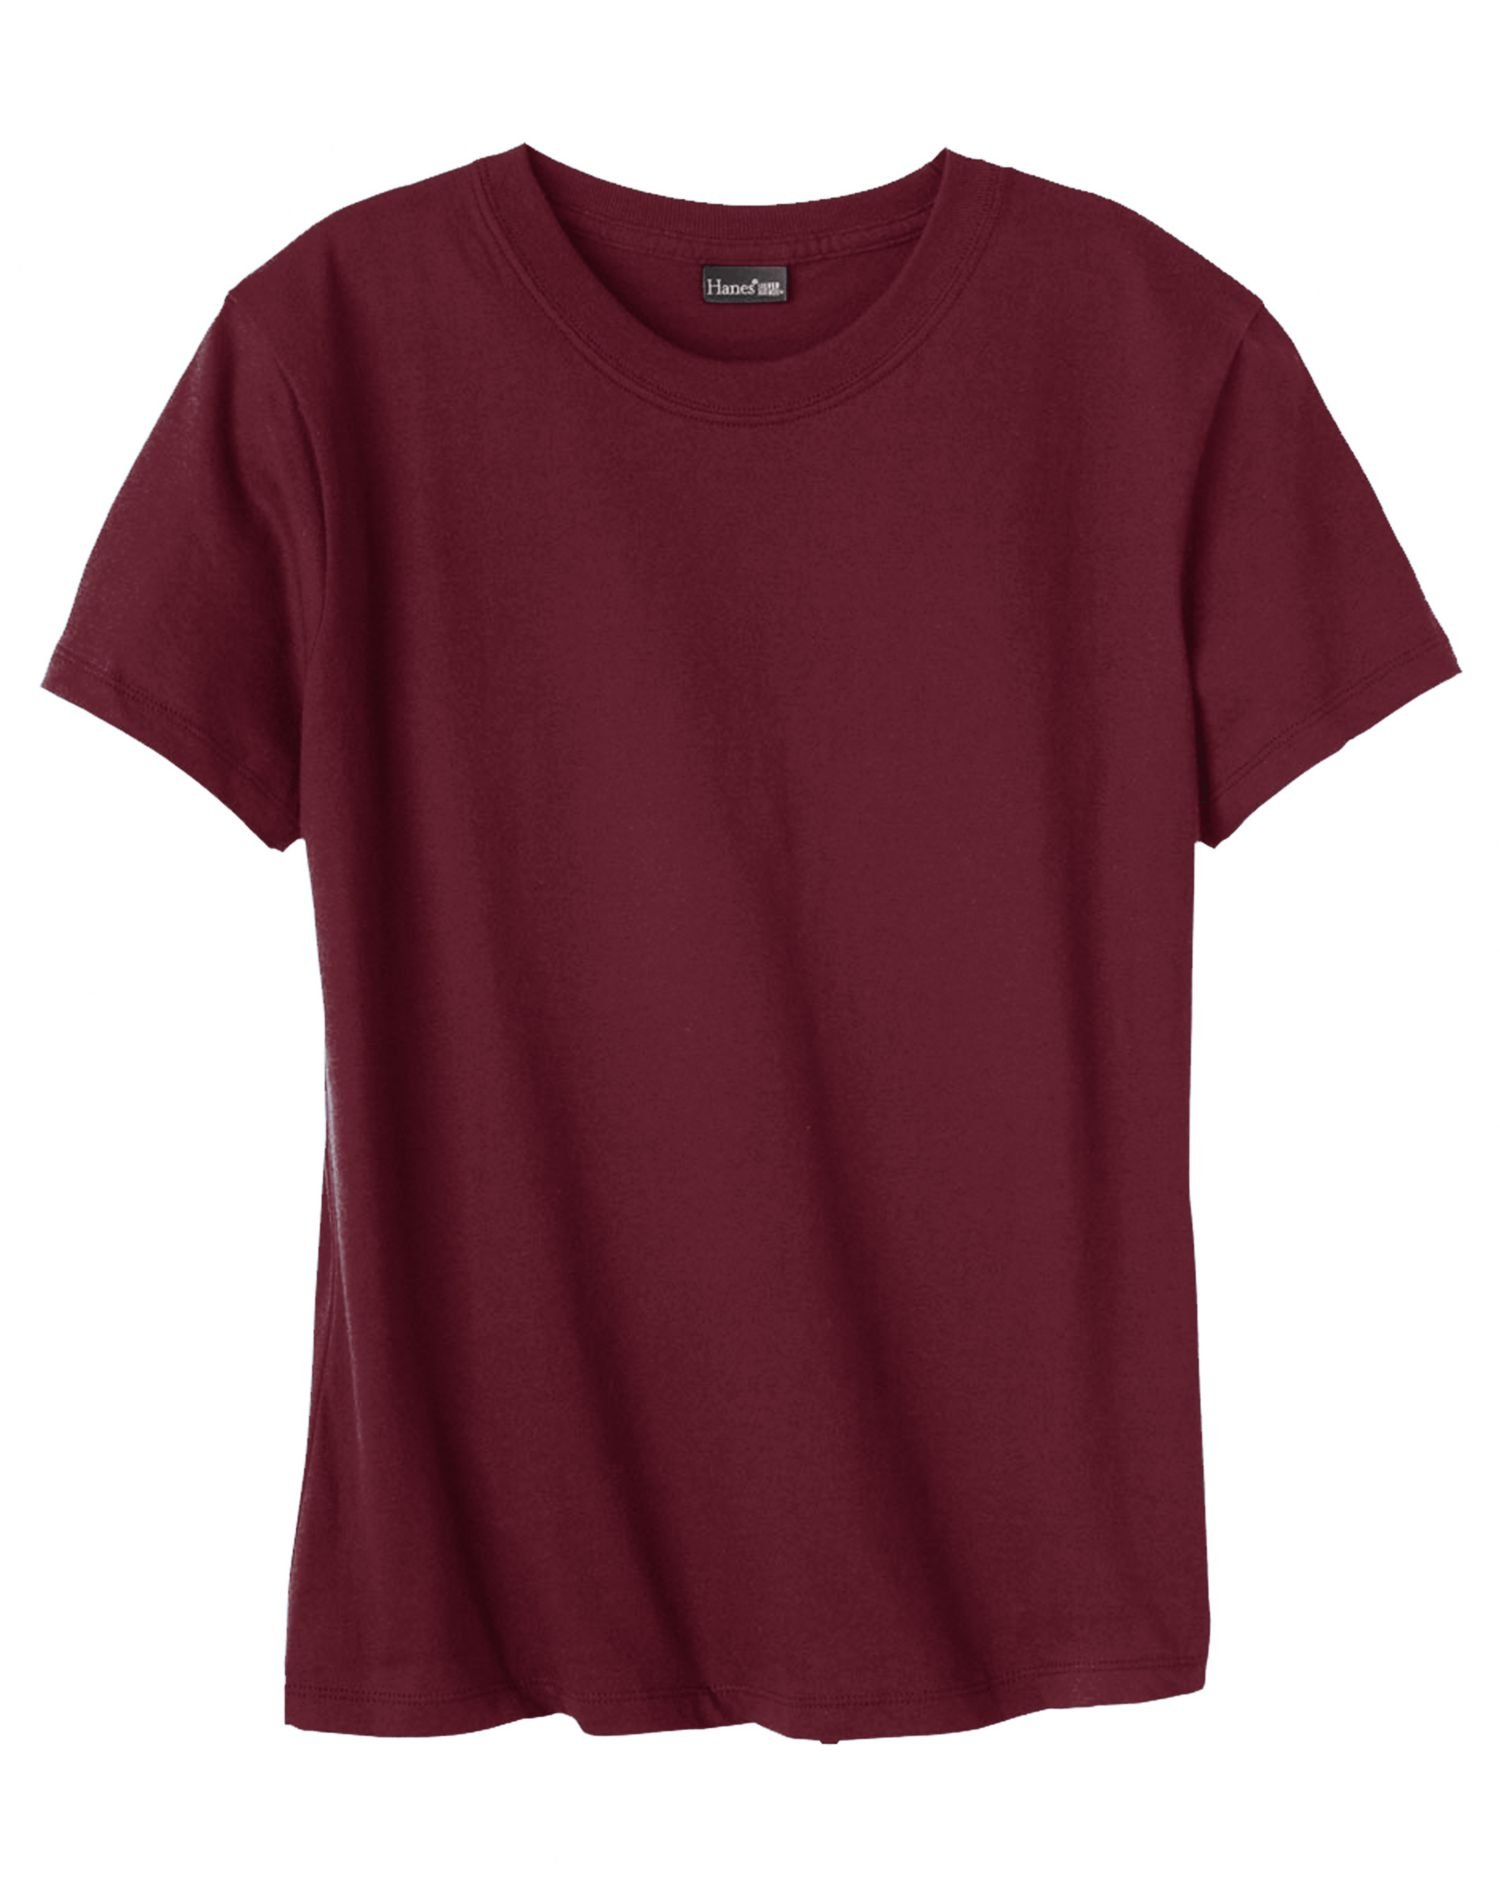 Hanes 4.5 oz Women's NANO-T Lightweight Premium T-Shirt - Maroon - S